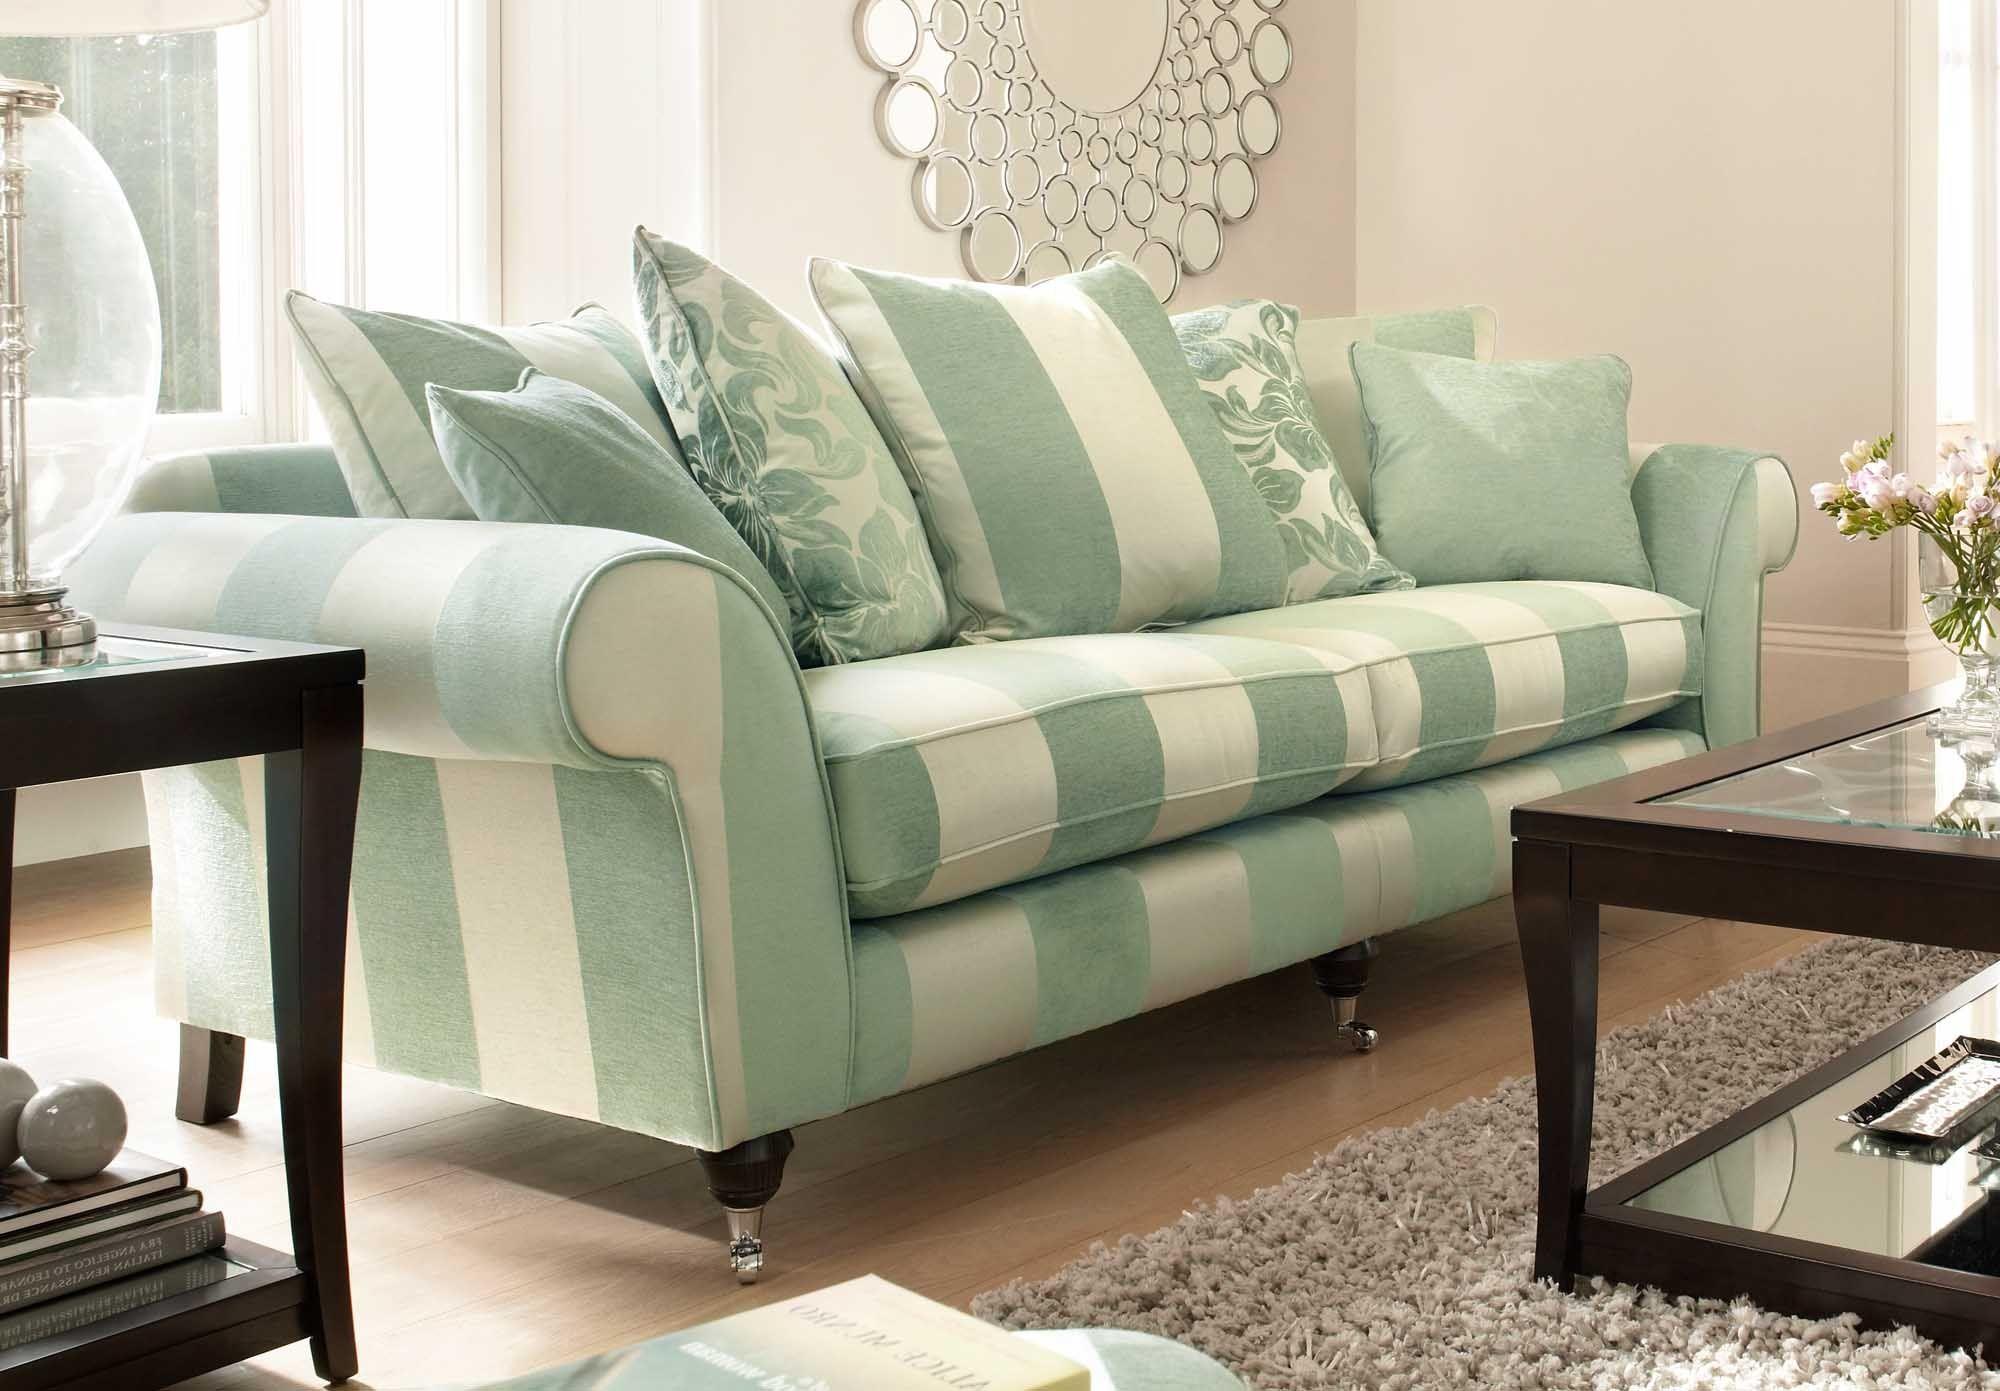 Ashley Manor Harriet Sofa In Mink Lounge Cafe Amman 4 Seater Scatter Back Wellington Sets